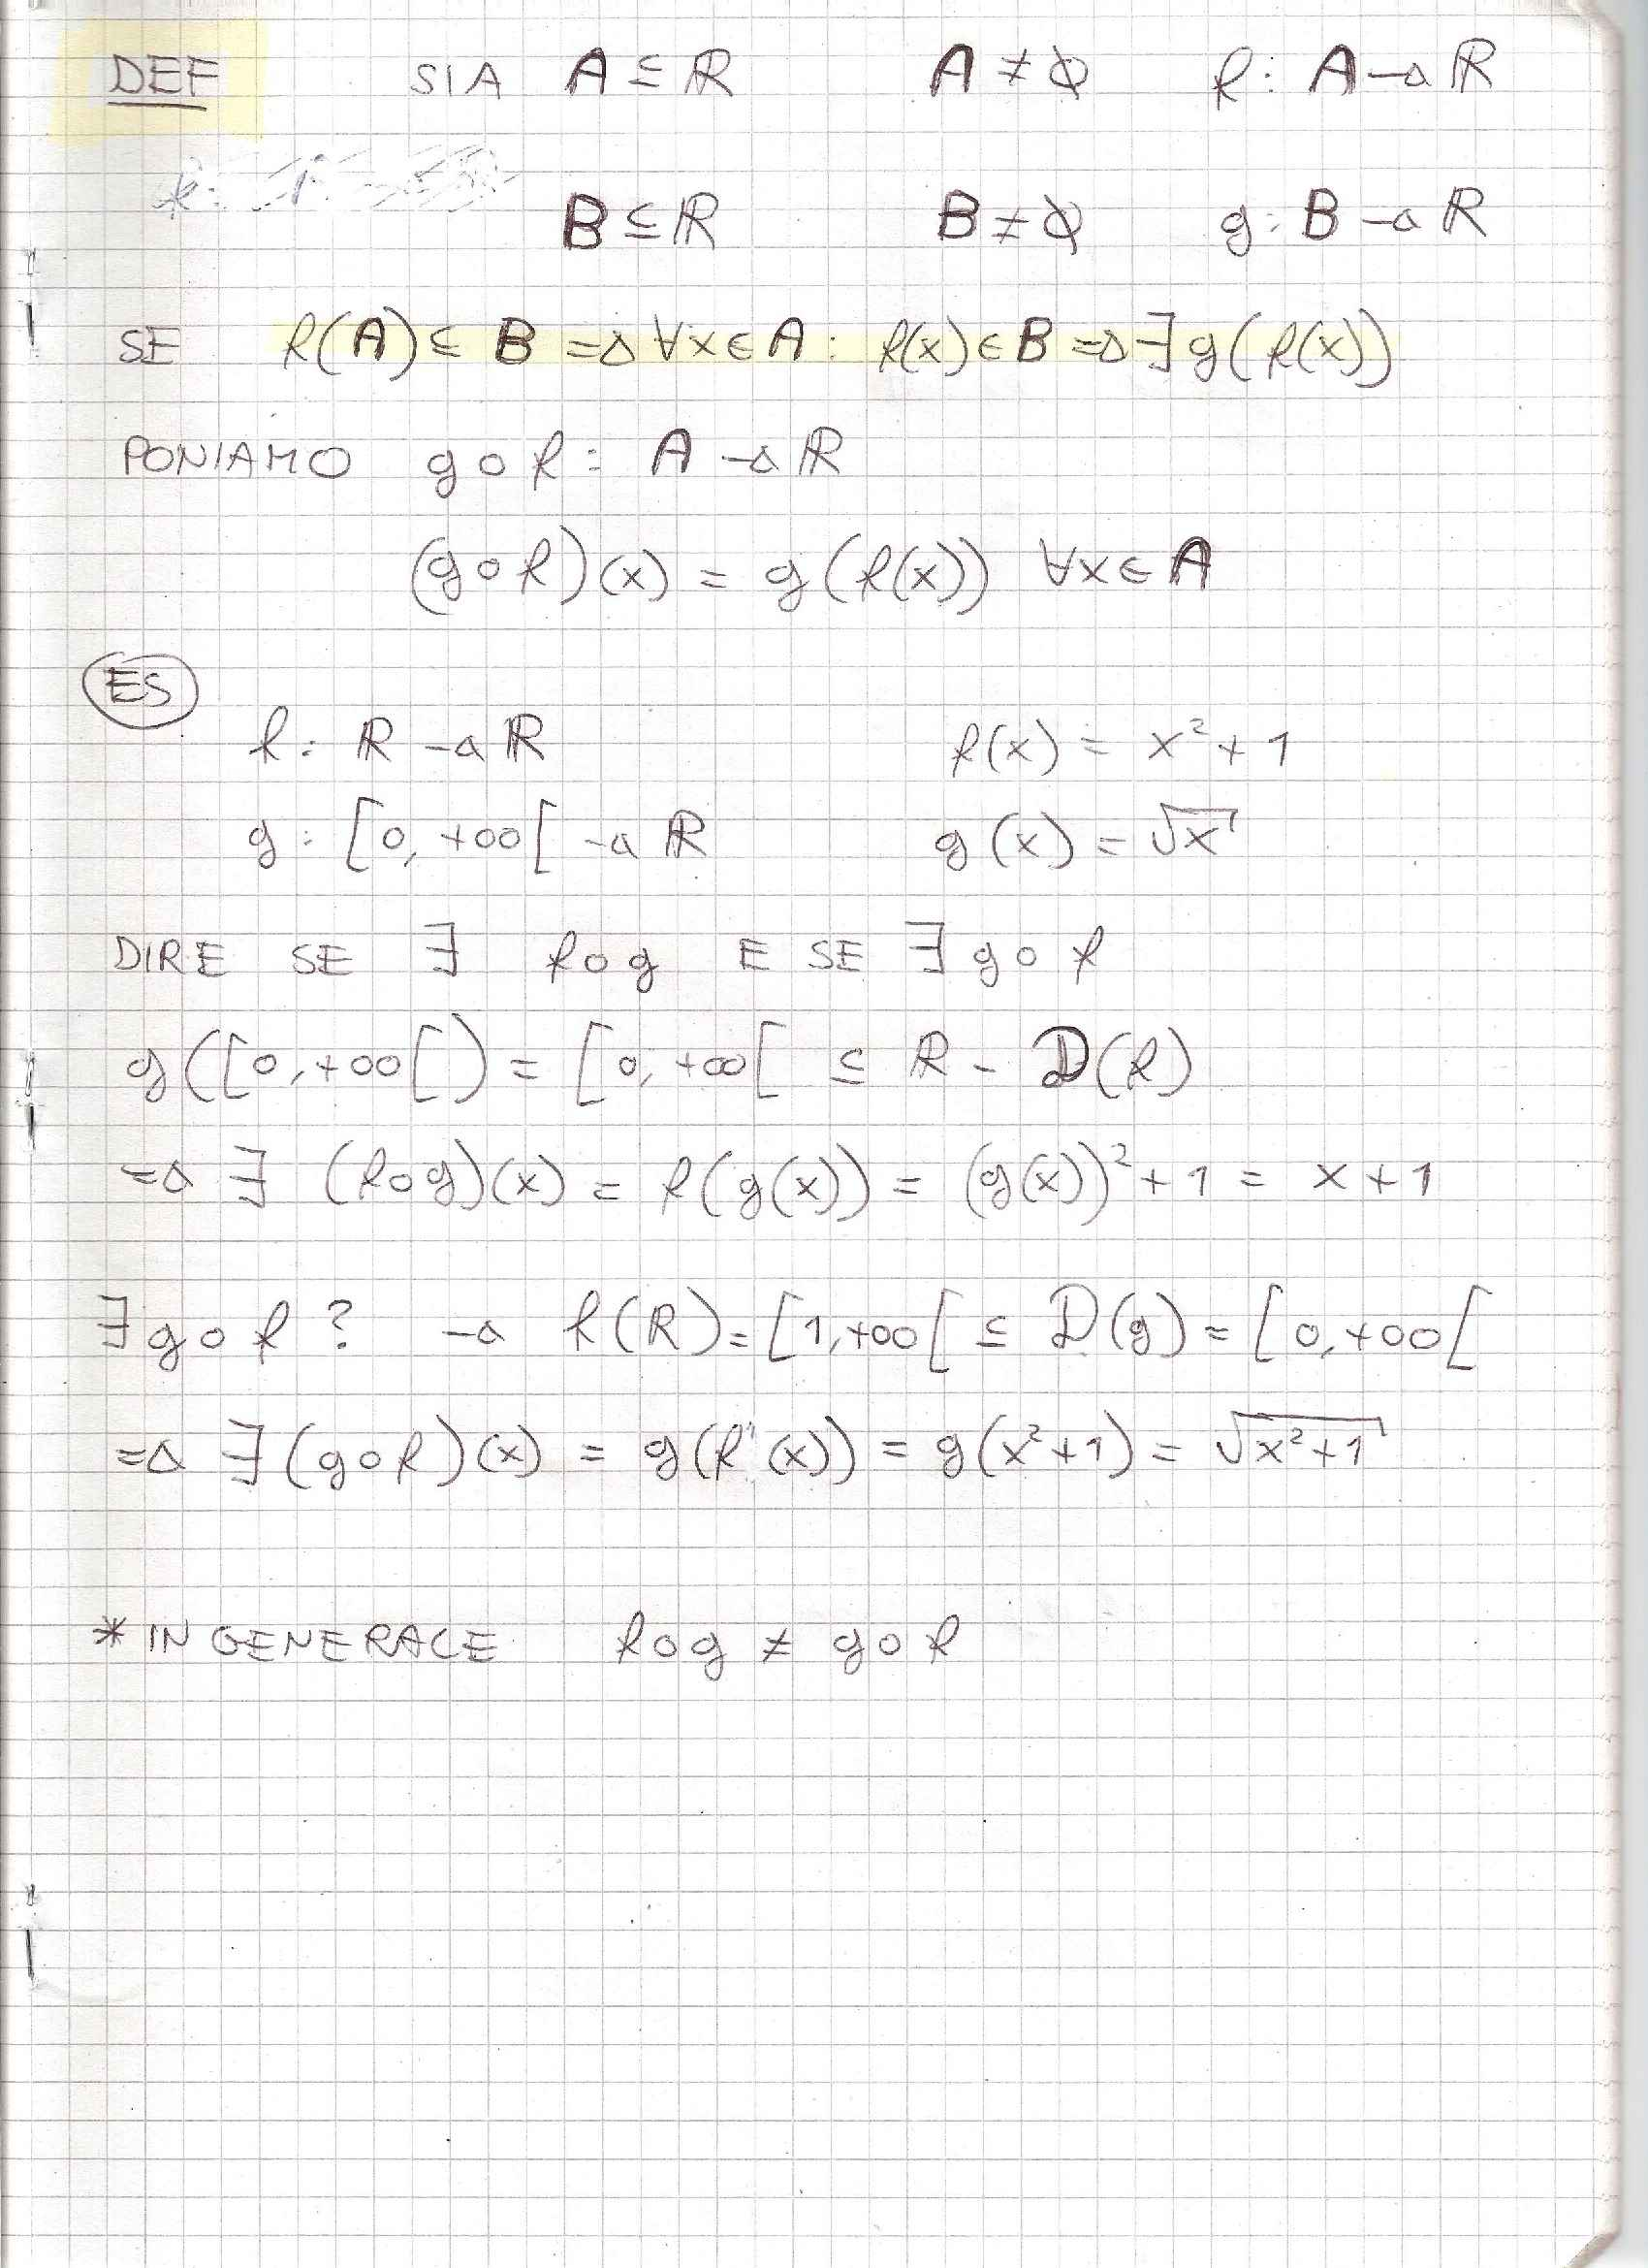 Analisi Matematica - Appunti Pag. 41